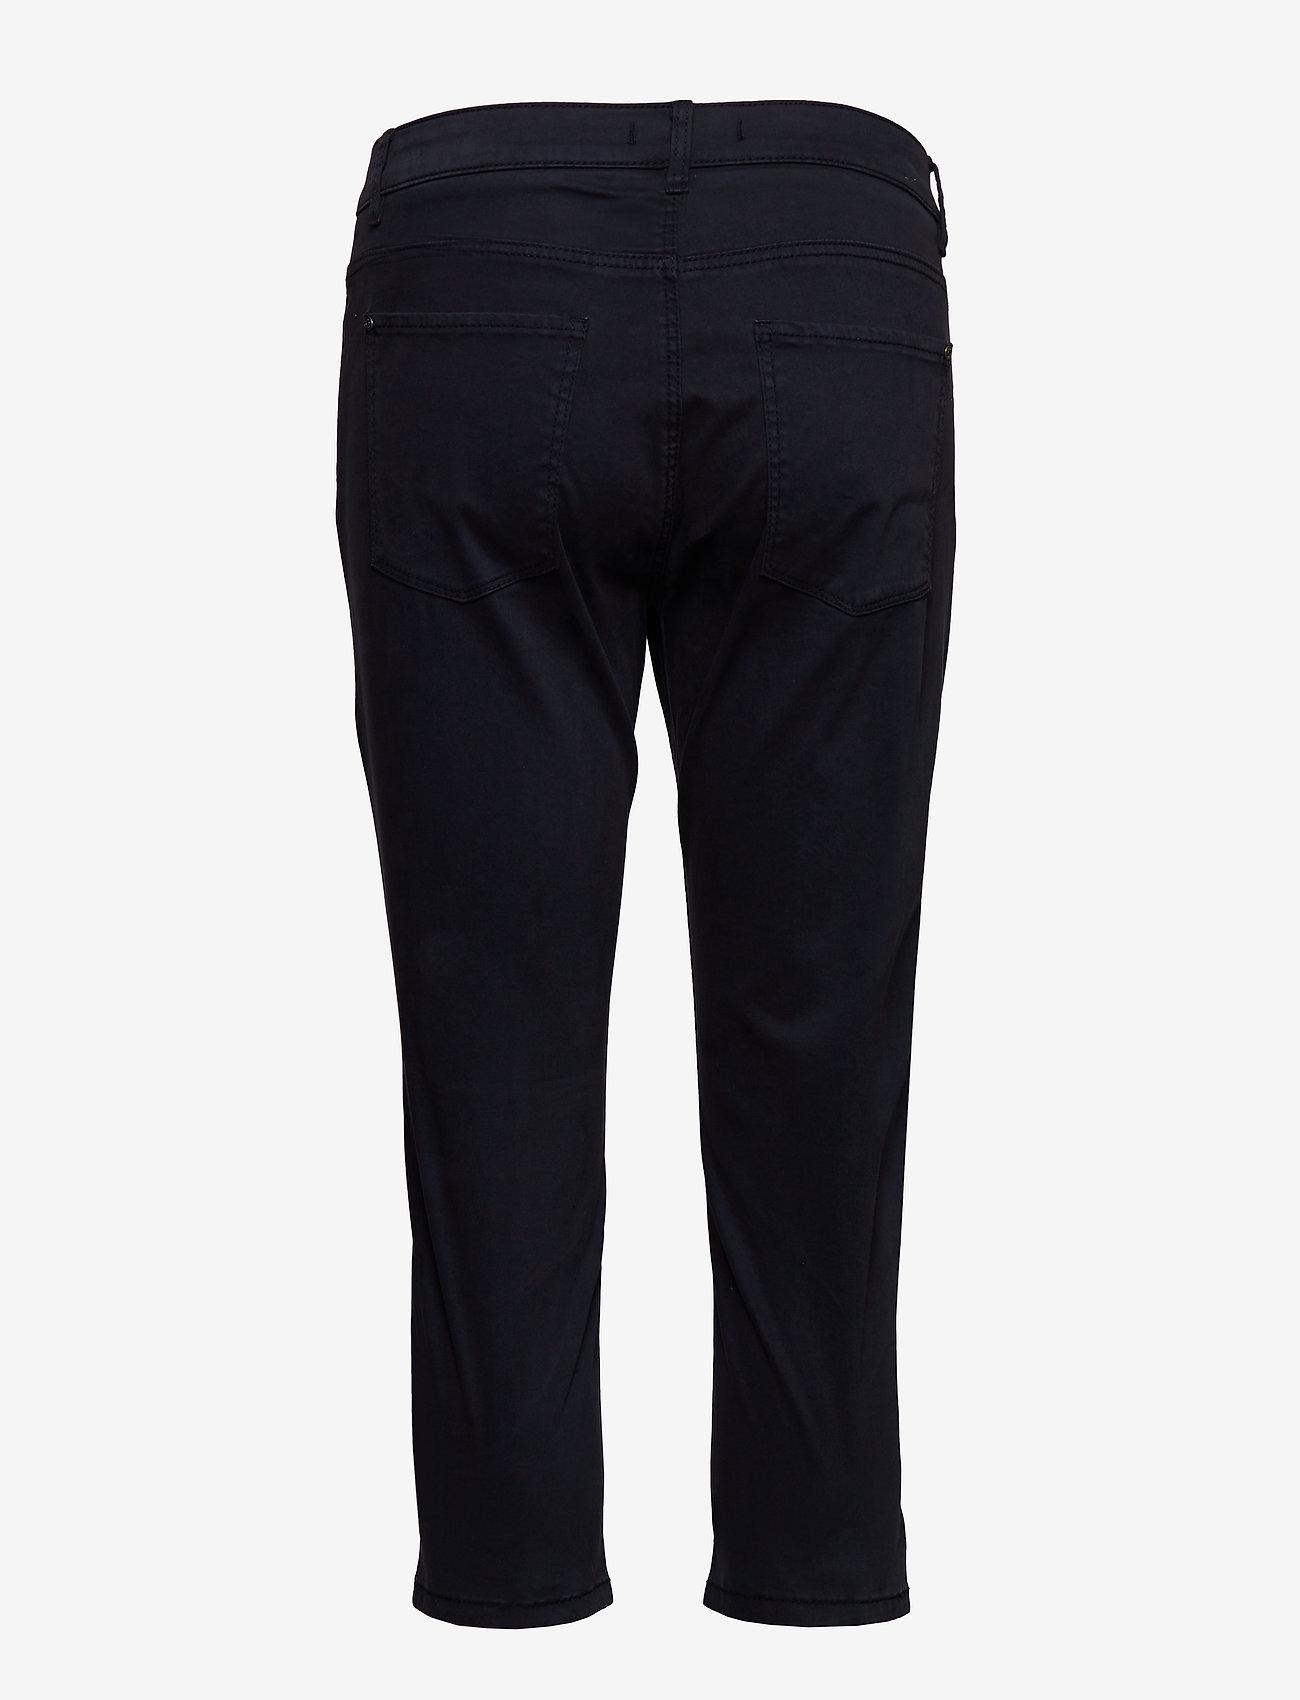 Esprit Casual - Pants woven - casual bukser - navy - 1